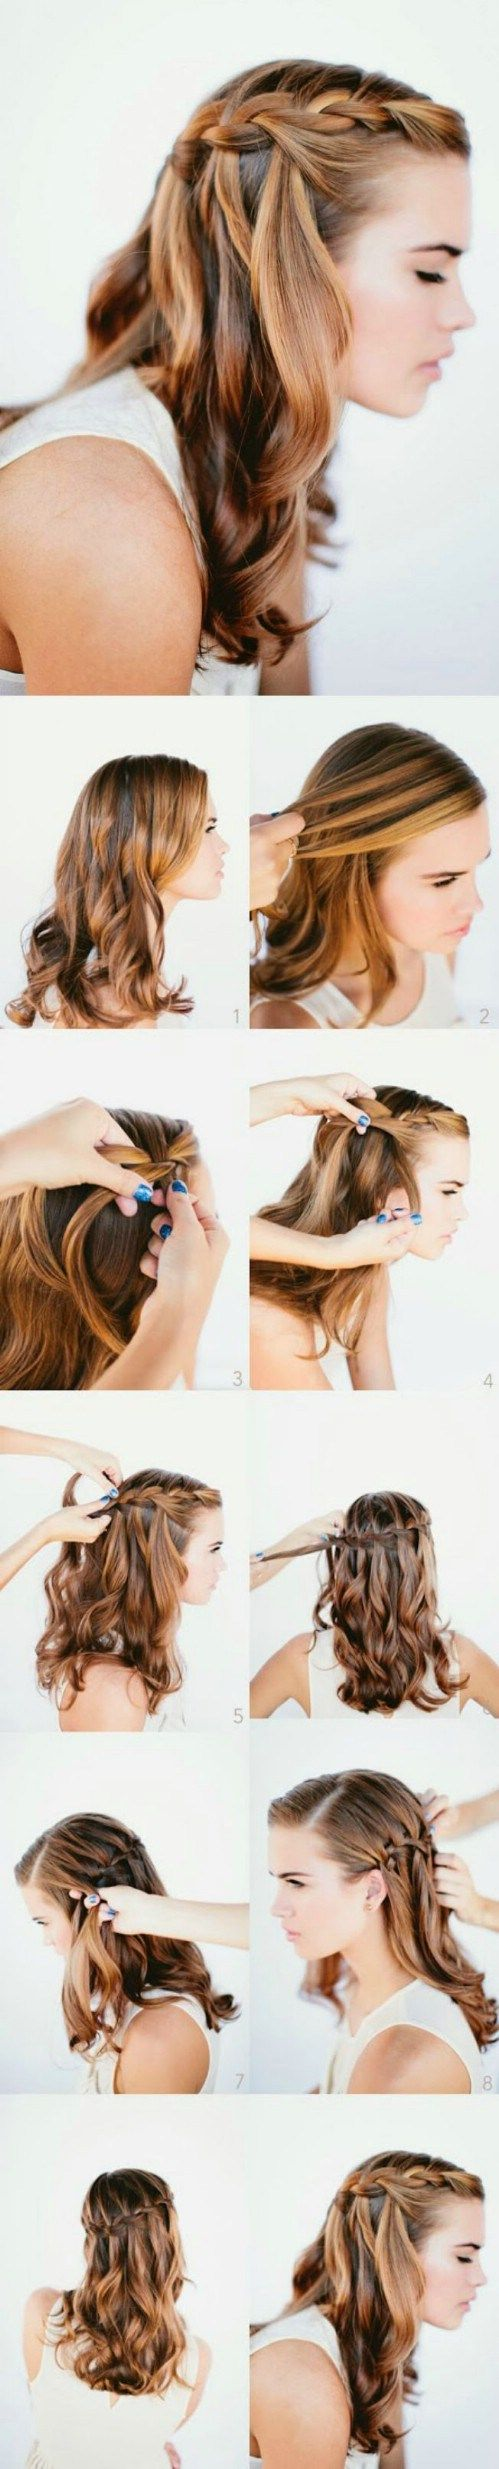 Waterfall Braid Long Hairstyle Tutorial.